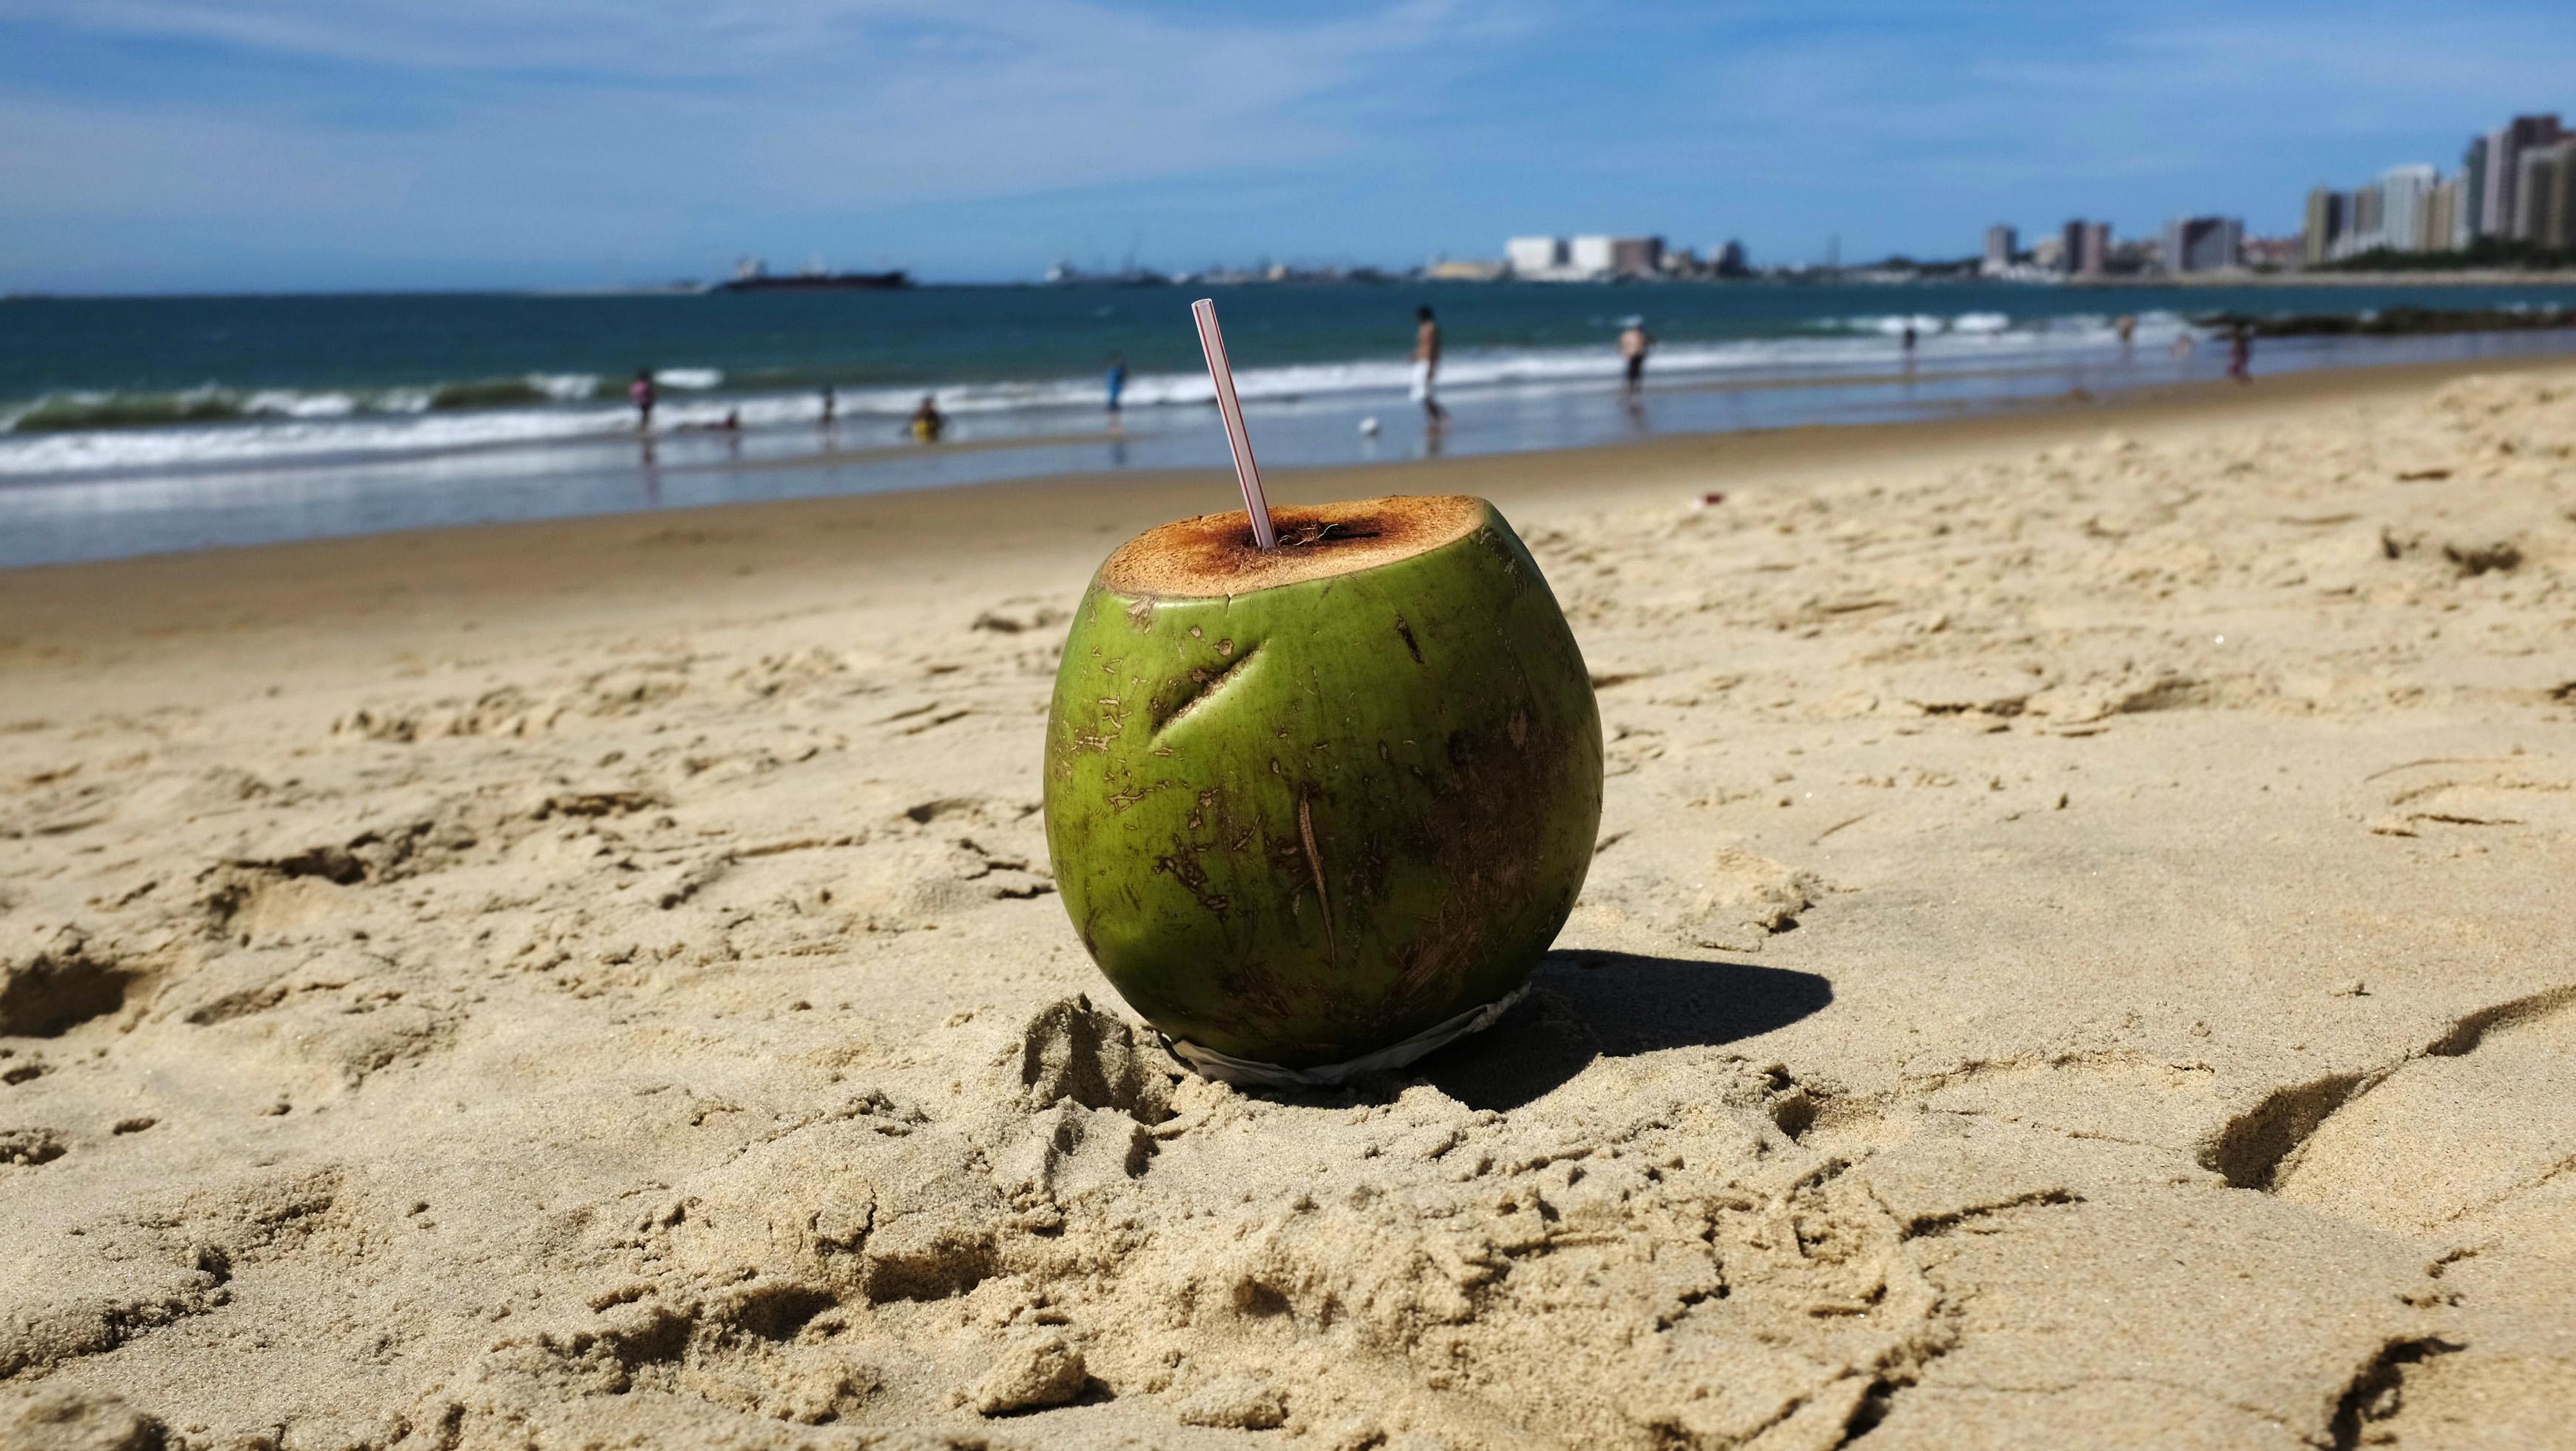 c-coconut-RTR3WPWF-Murad Sezer